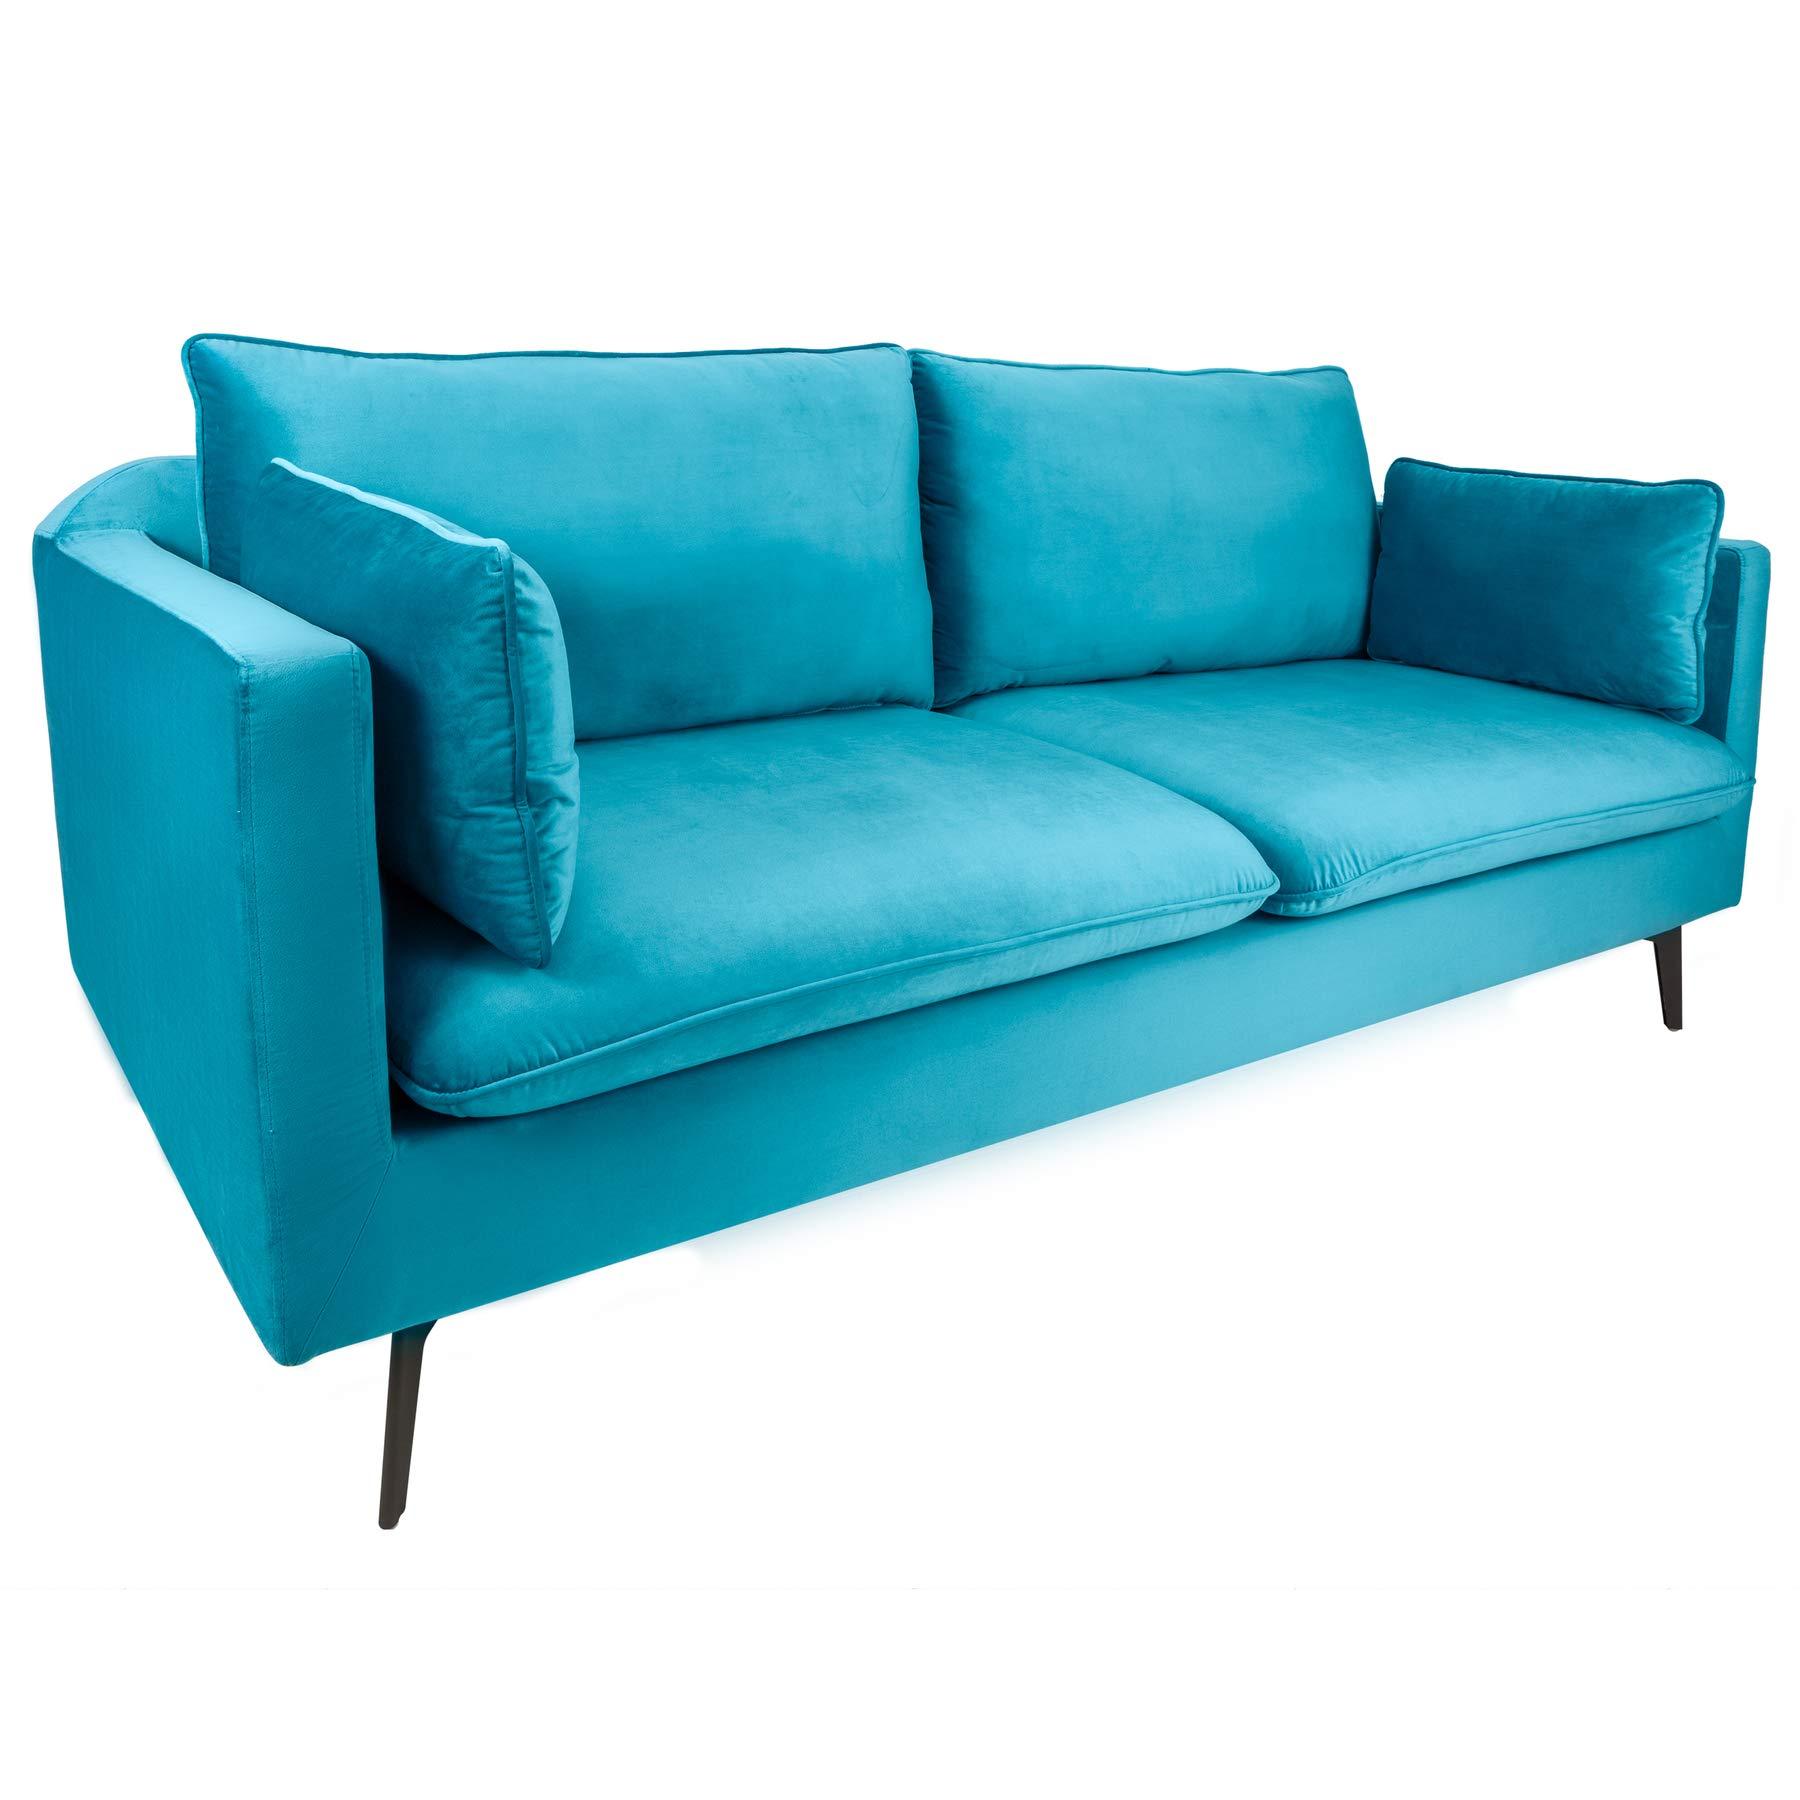 Full Size of Sofa Blau Riess Ambiente Design 3er Famous Aqua 210cm Samt Baxter Luxus Kissen Günstig Kaufen Modulares Chesterfield Leder Heimkino Big Eck Grün Barock Sofa Sofa Blau